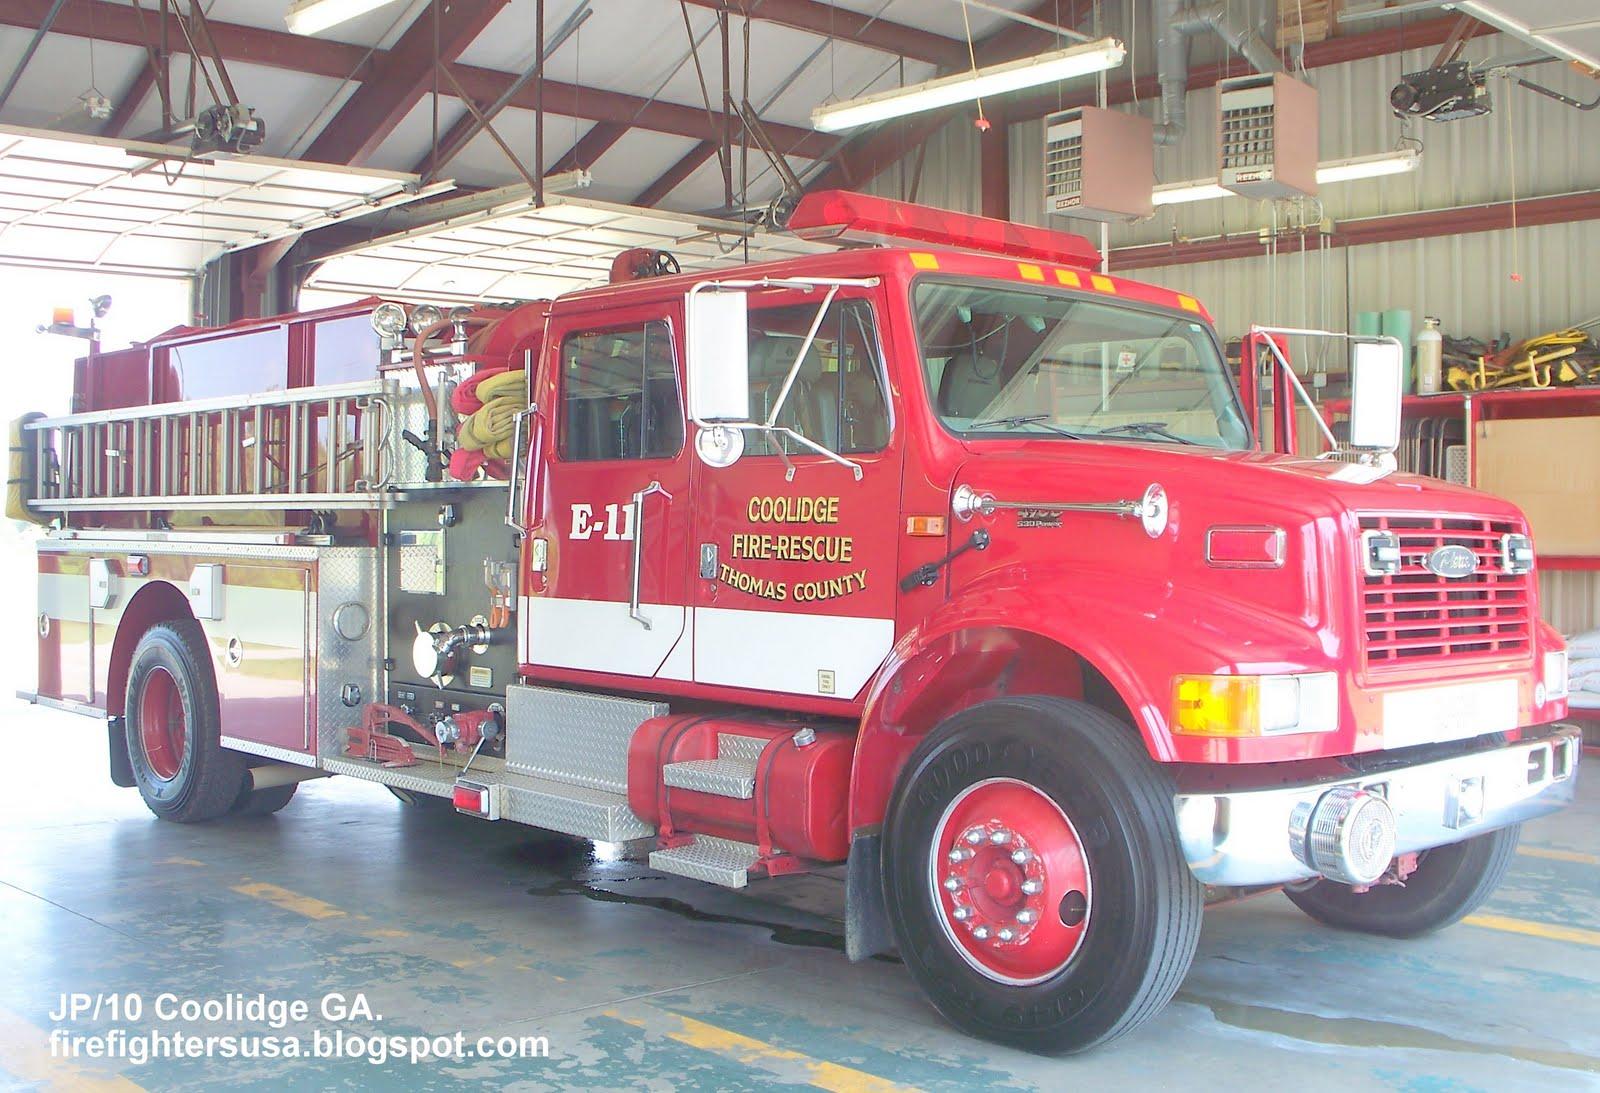 http://1.bp.blogspot.com/_OLc2TjnHOgQ/S8myOdJArRI/AAAAAAAAwEE/1H4Woa7hOSg/s1600/Thomas+County+GA.+Fire+Rescue+Station+11+,Pierce+Pumper+Fire+Truck+E-11,+Coolidge+Georgia.JPG